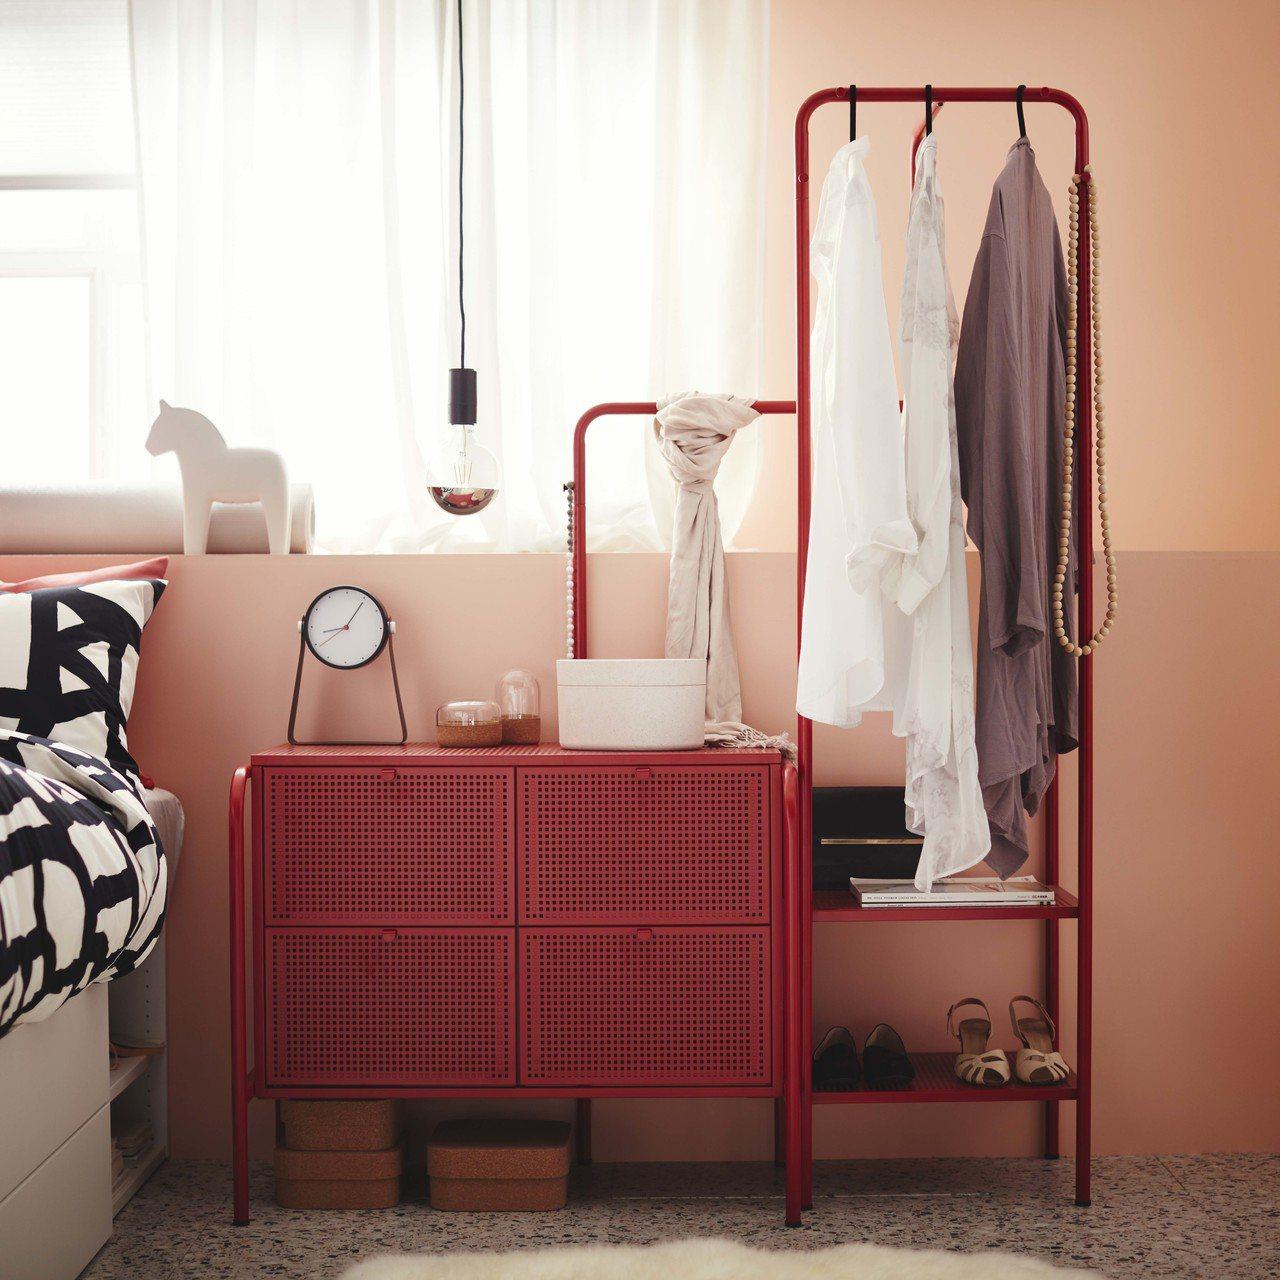 NIKKEBY抽屜櫃(4抽,紅色),售價2,999元。圖/IKEA提供